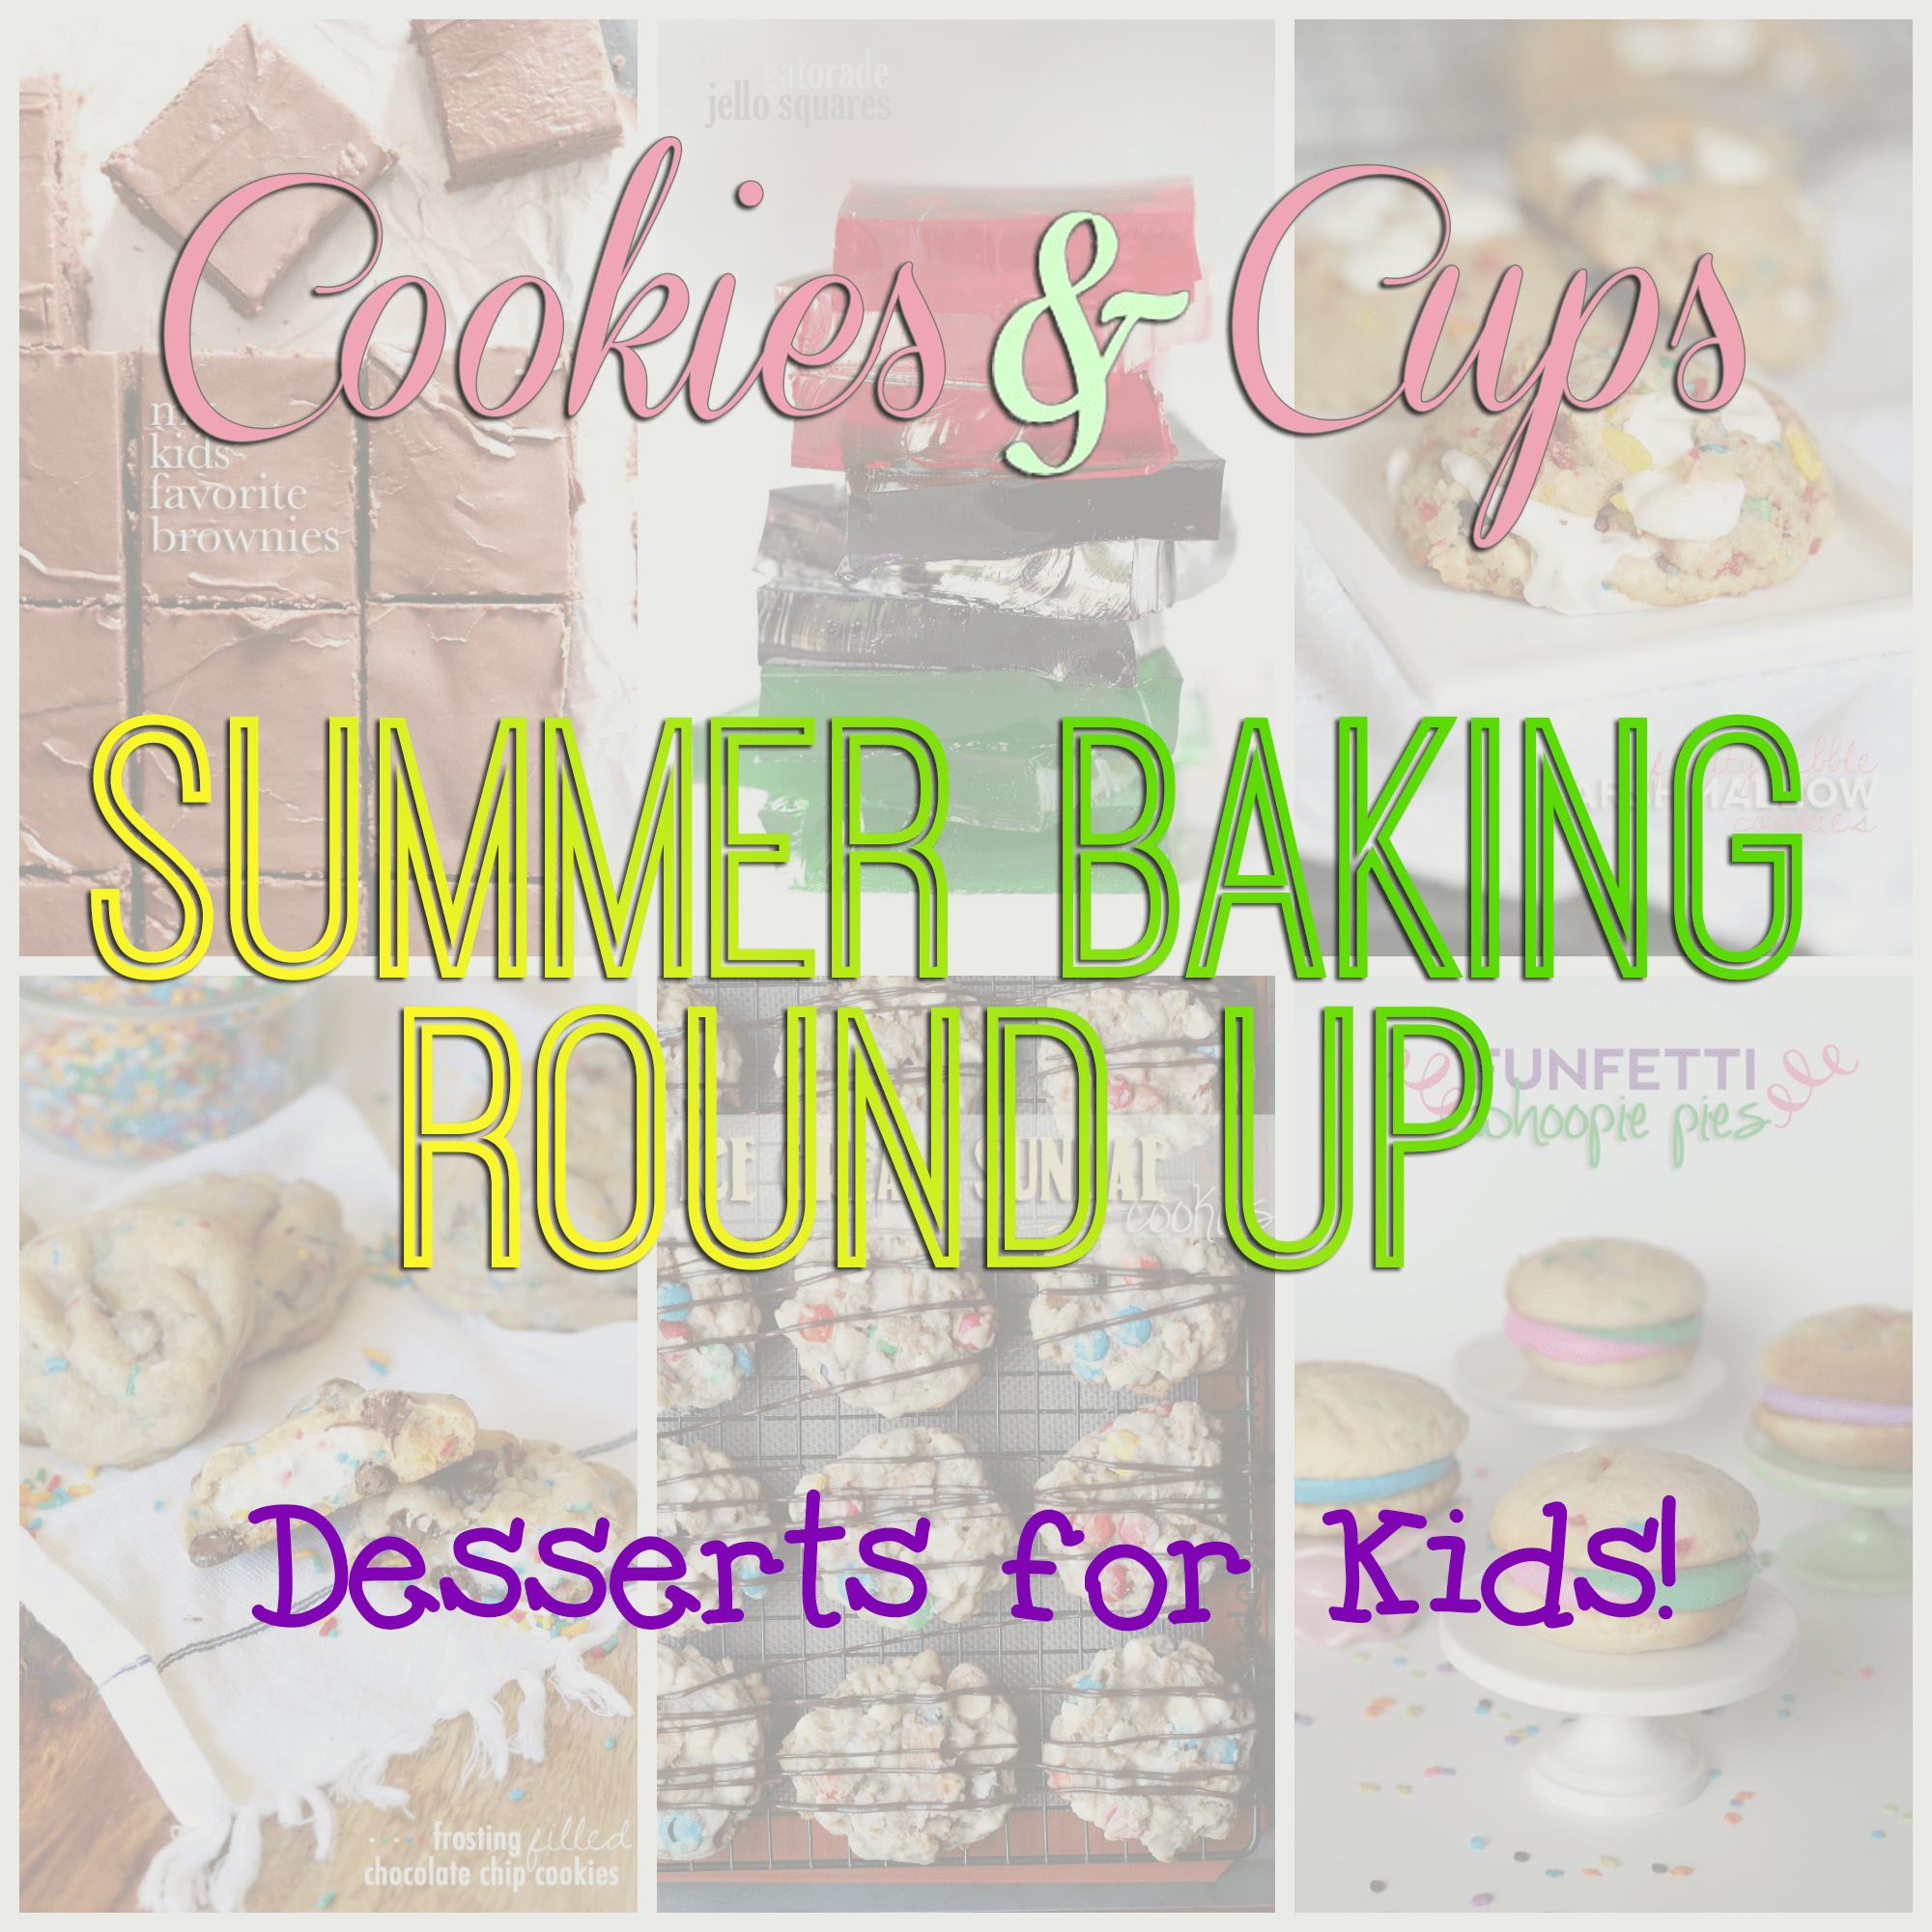 My Kid's Favorite Desserts! A fun round up of my kid's favorites!